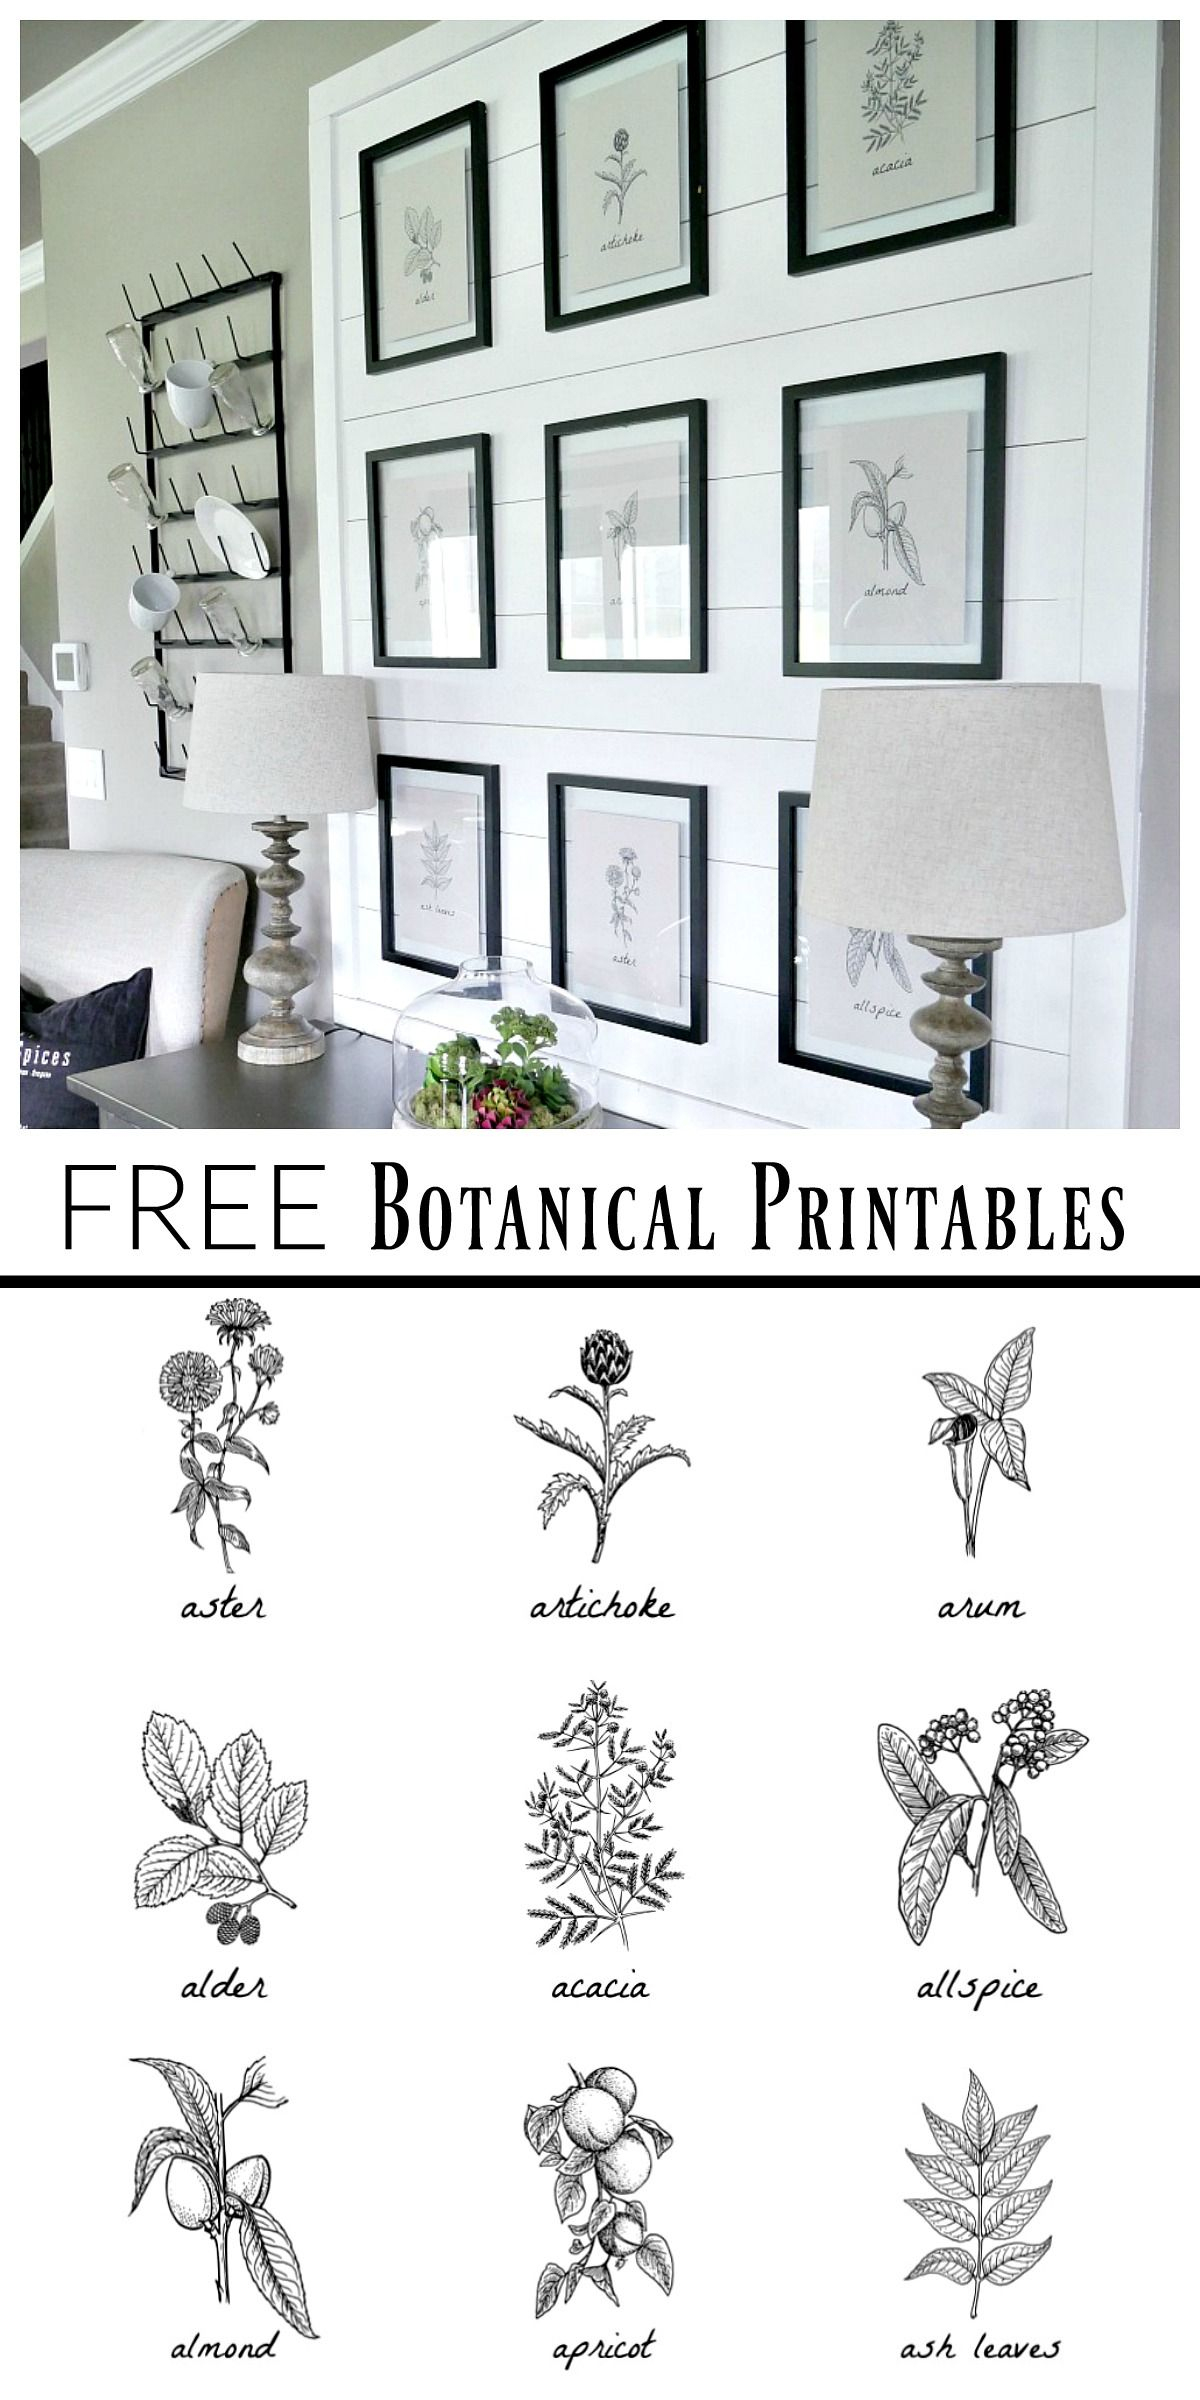 Free Botanical Prints | Bloggers' Best Diy Ideas | Diy Wall Art - Free Printable Artwork